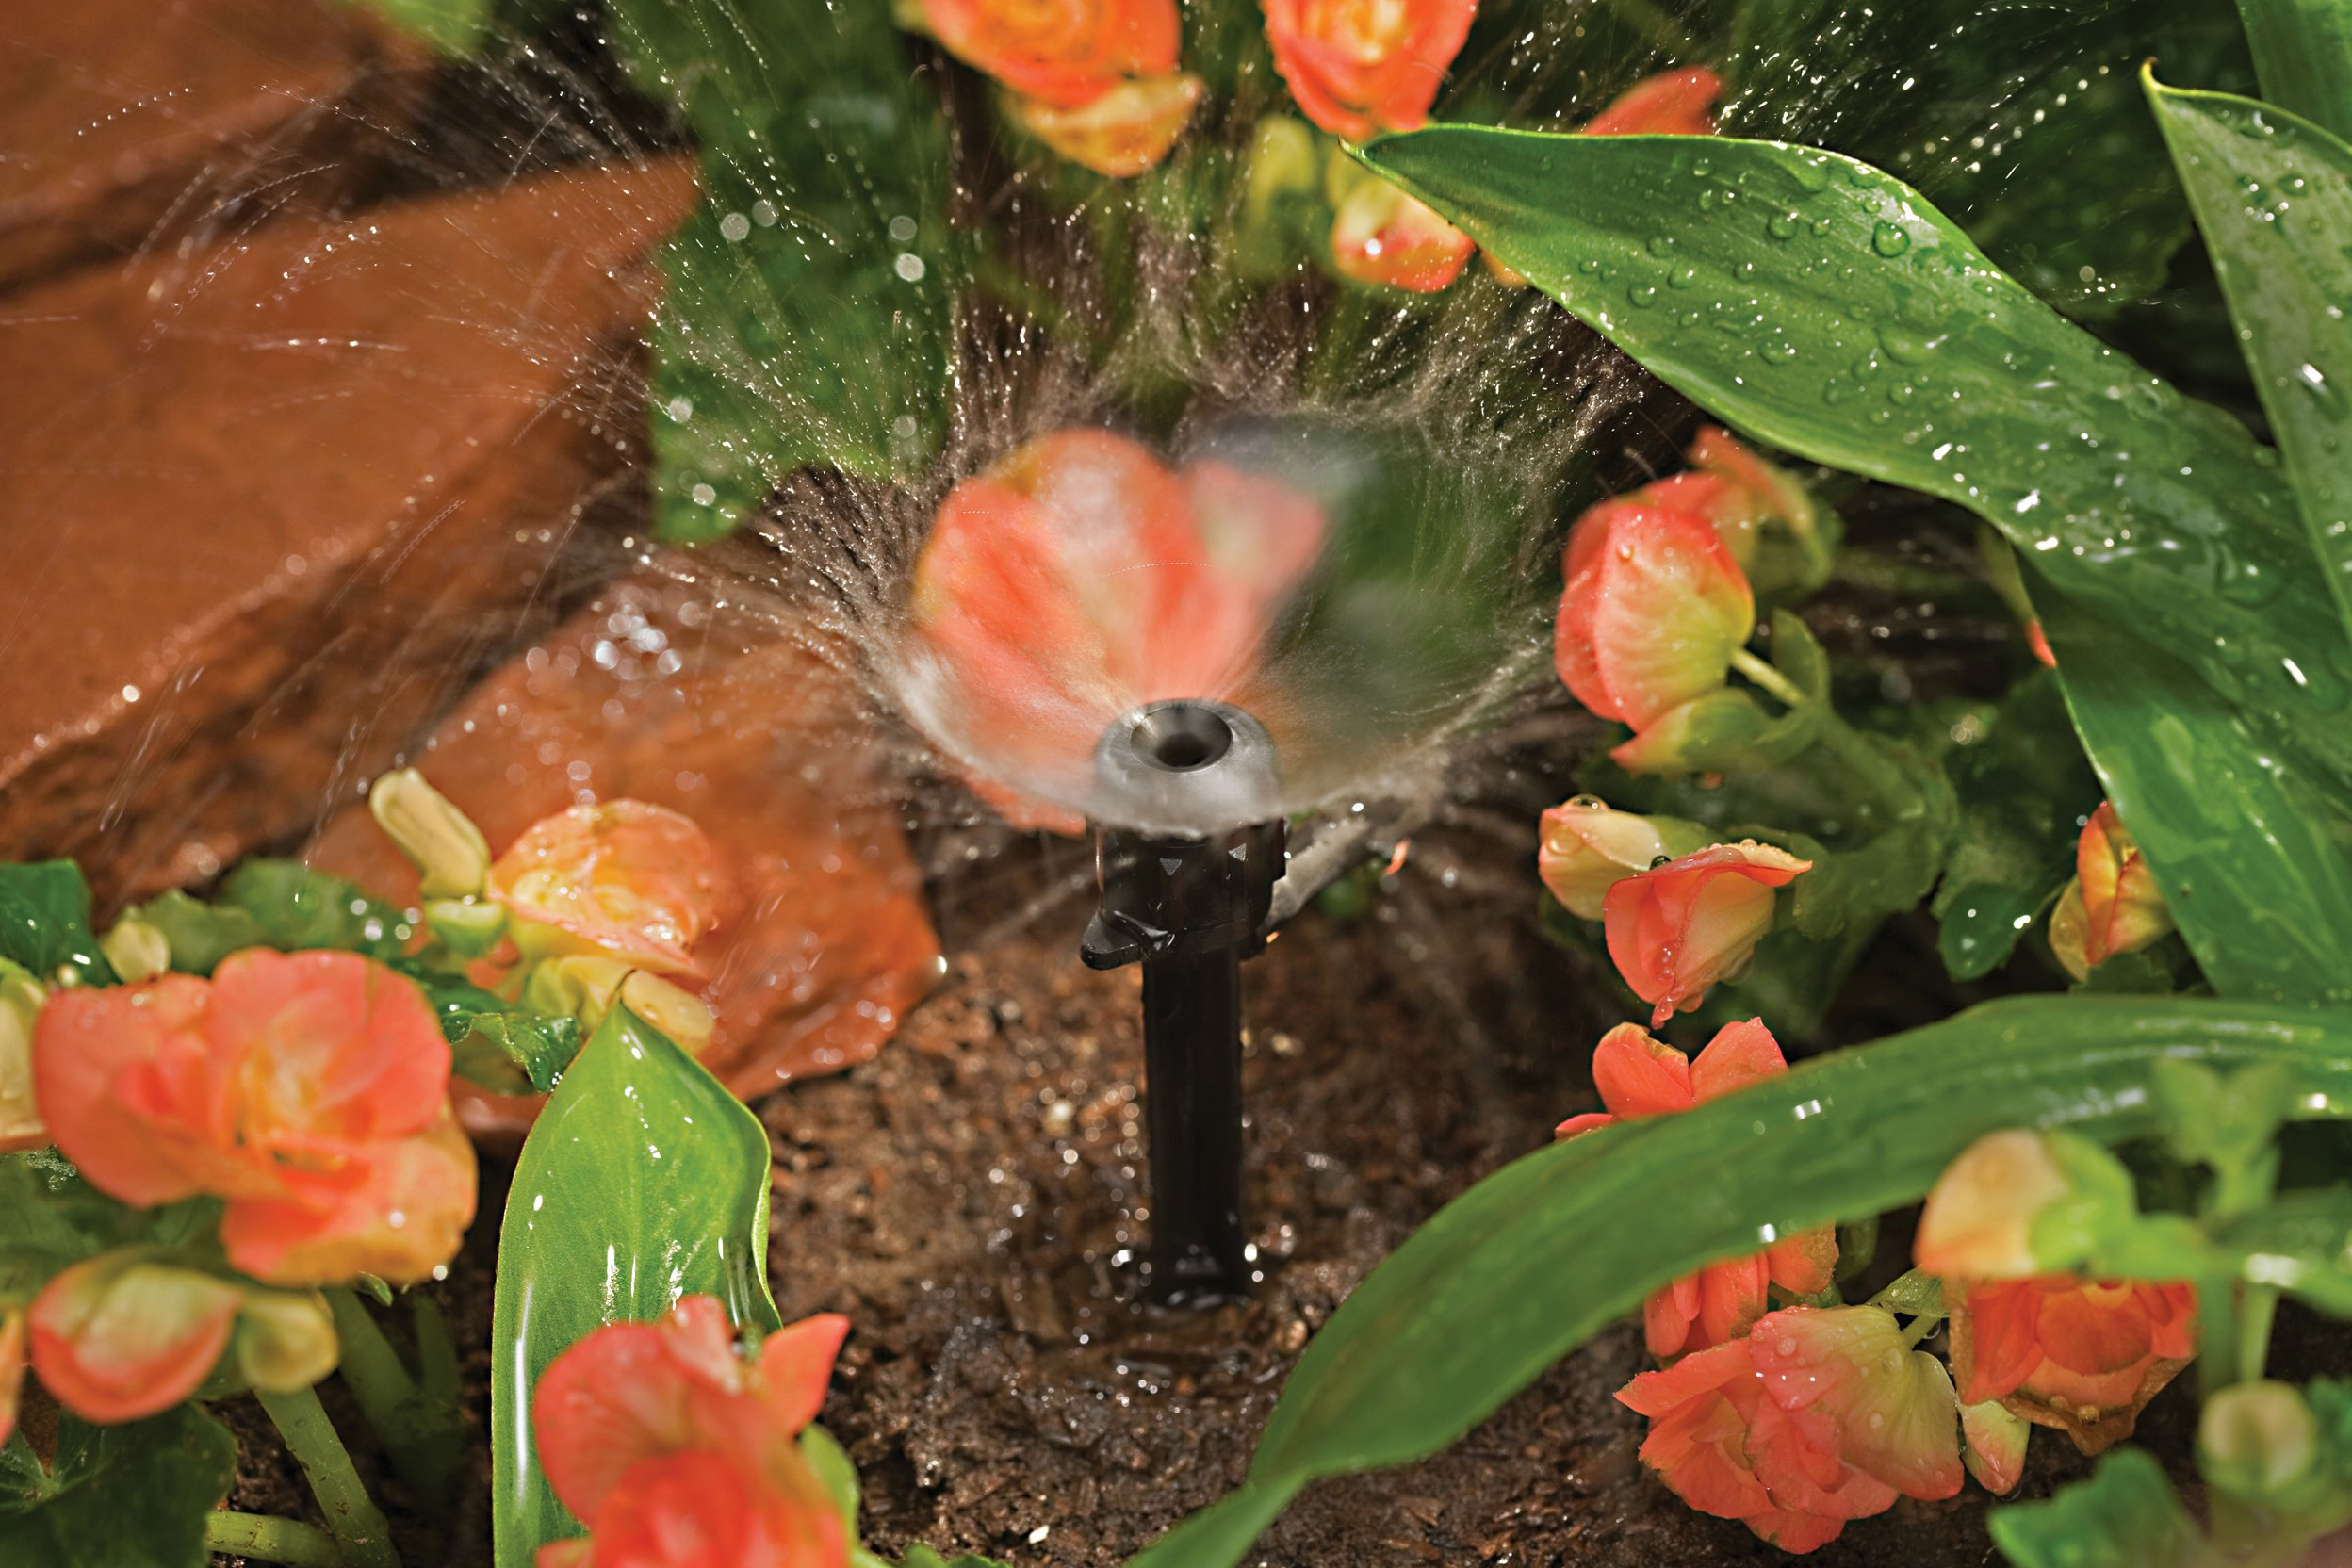 Orbit 69525 Micro Bubbler Complete Drip Irrigation Watering Kit